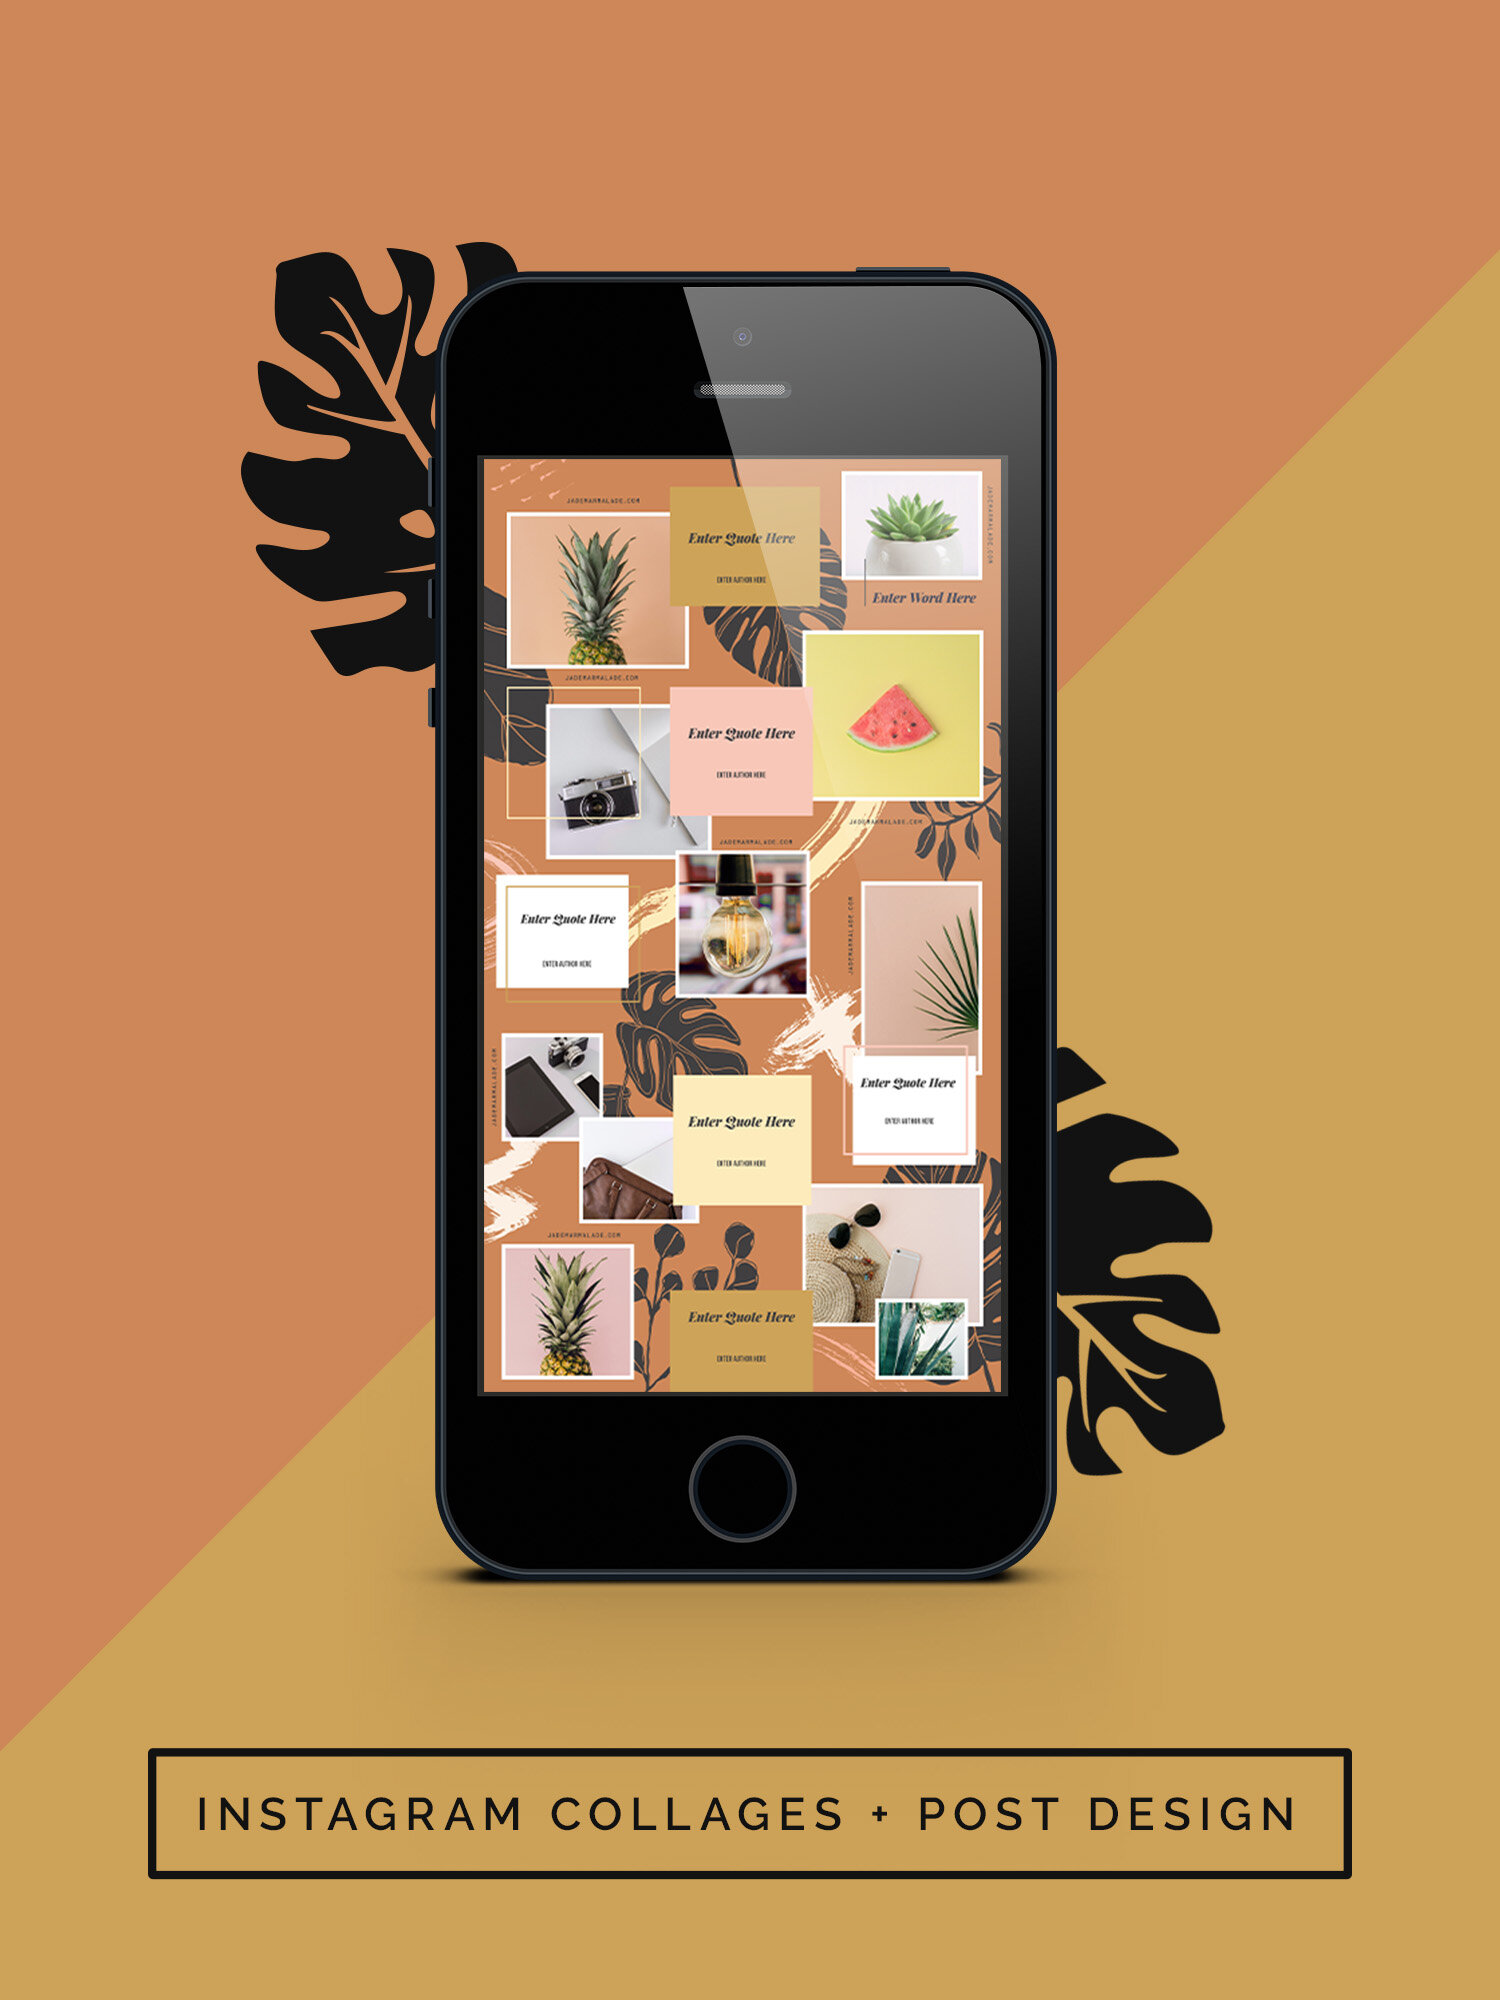 Instagram-Collages-Post-Design-Thumbnail-Shop.jpg